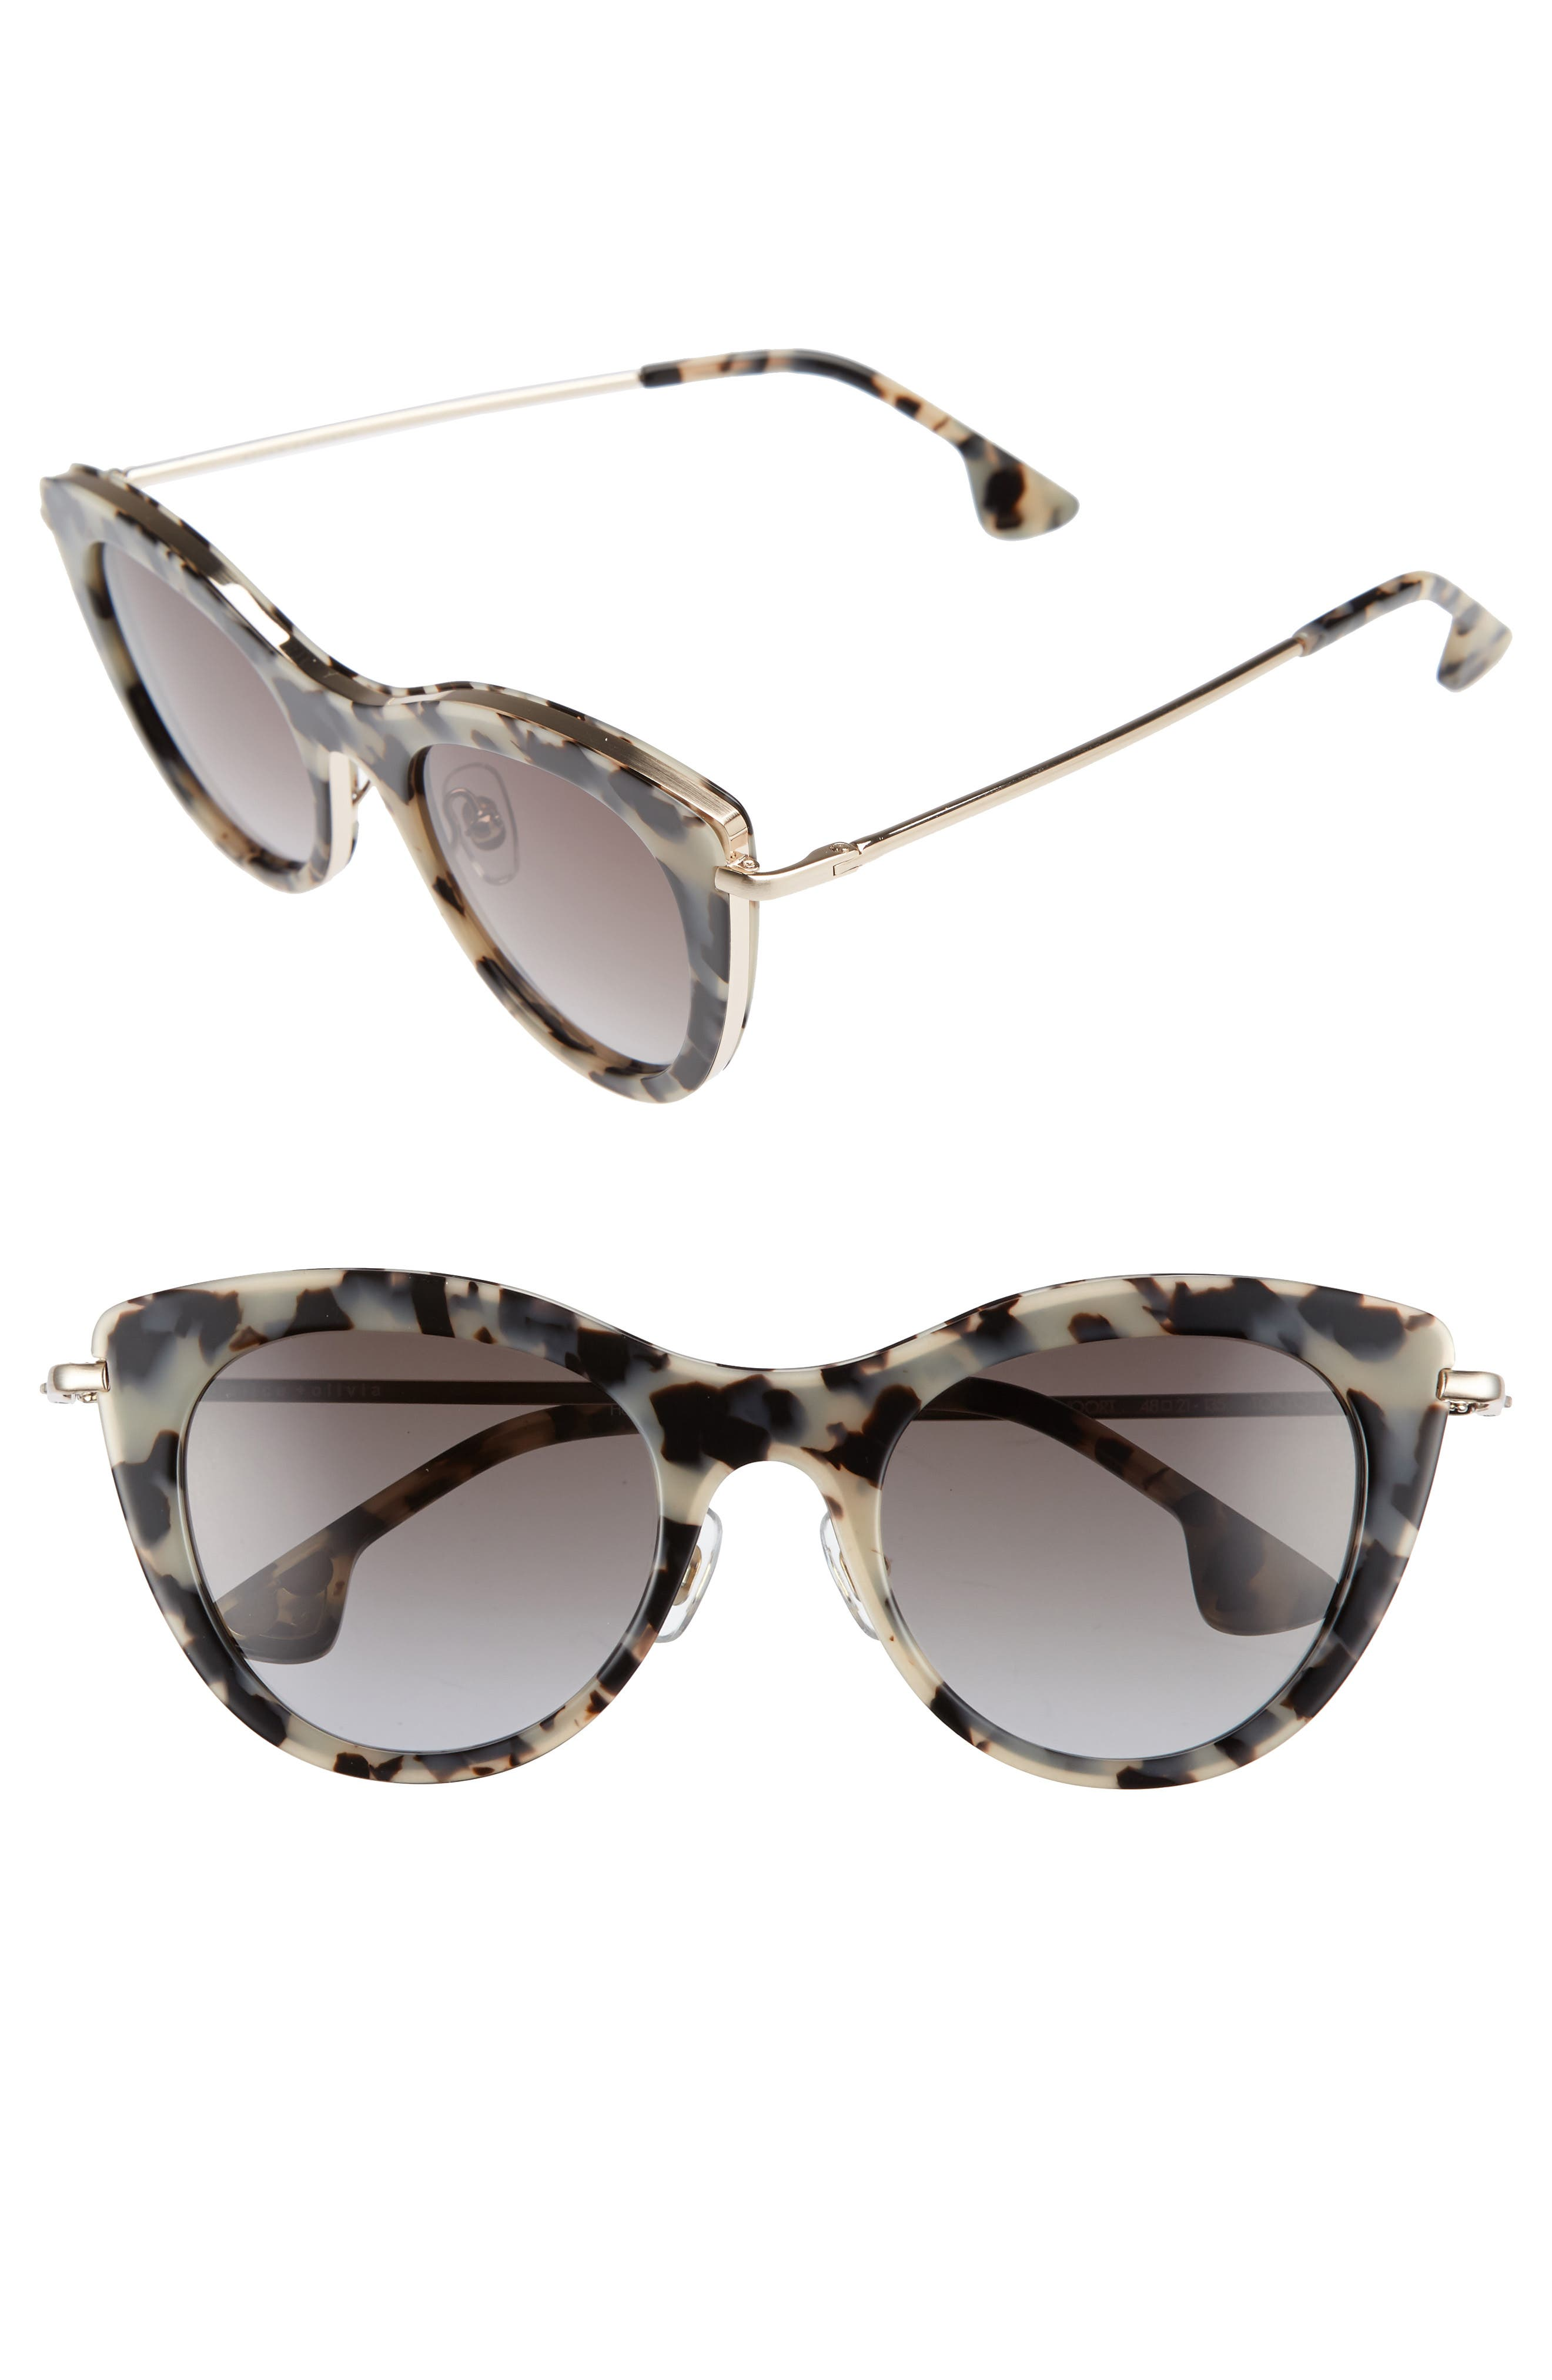 Alice + Olivia Gansevoort 48mm Special Fit Cat Eye Sunglasses